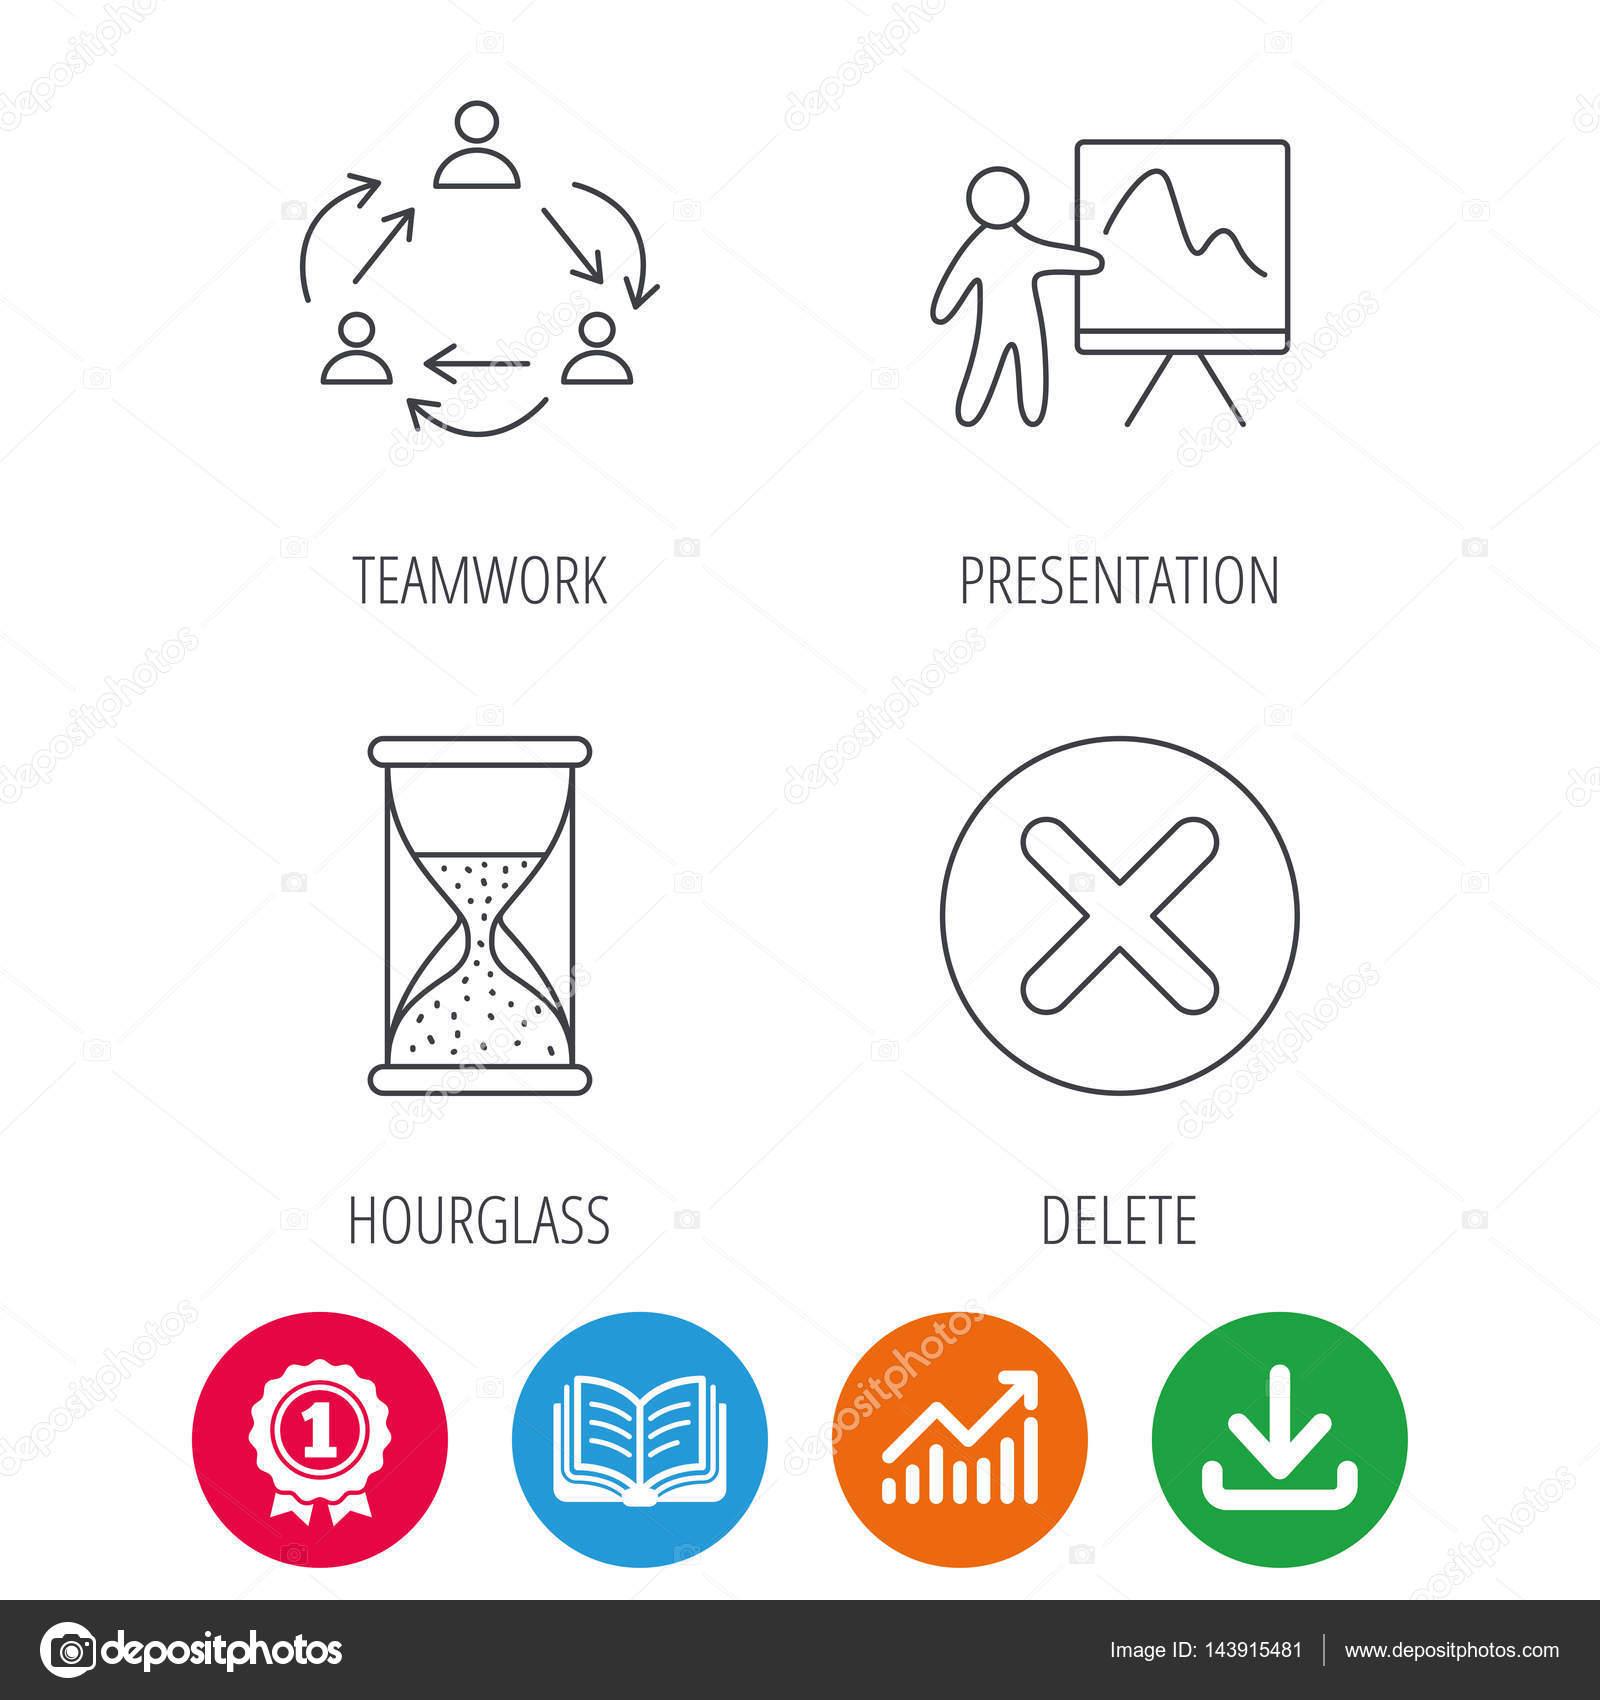 teamwork presentation and hourglass icons stock vector